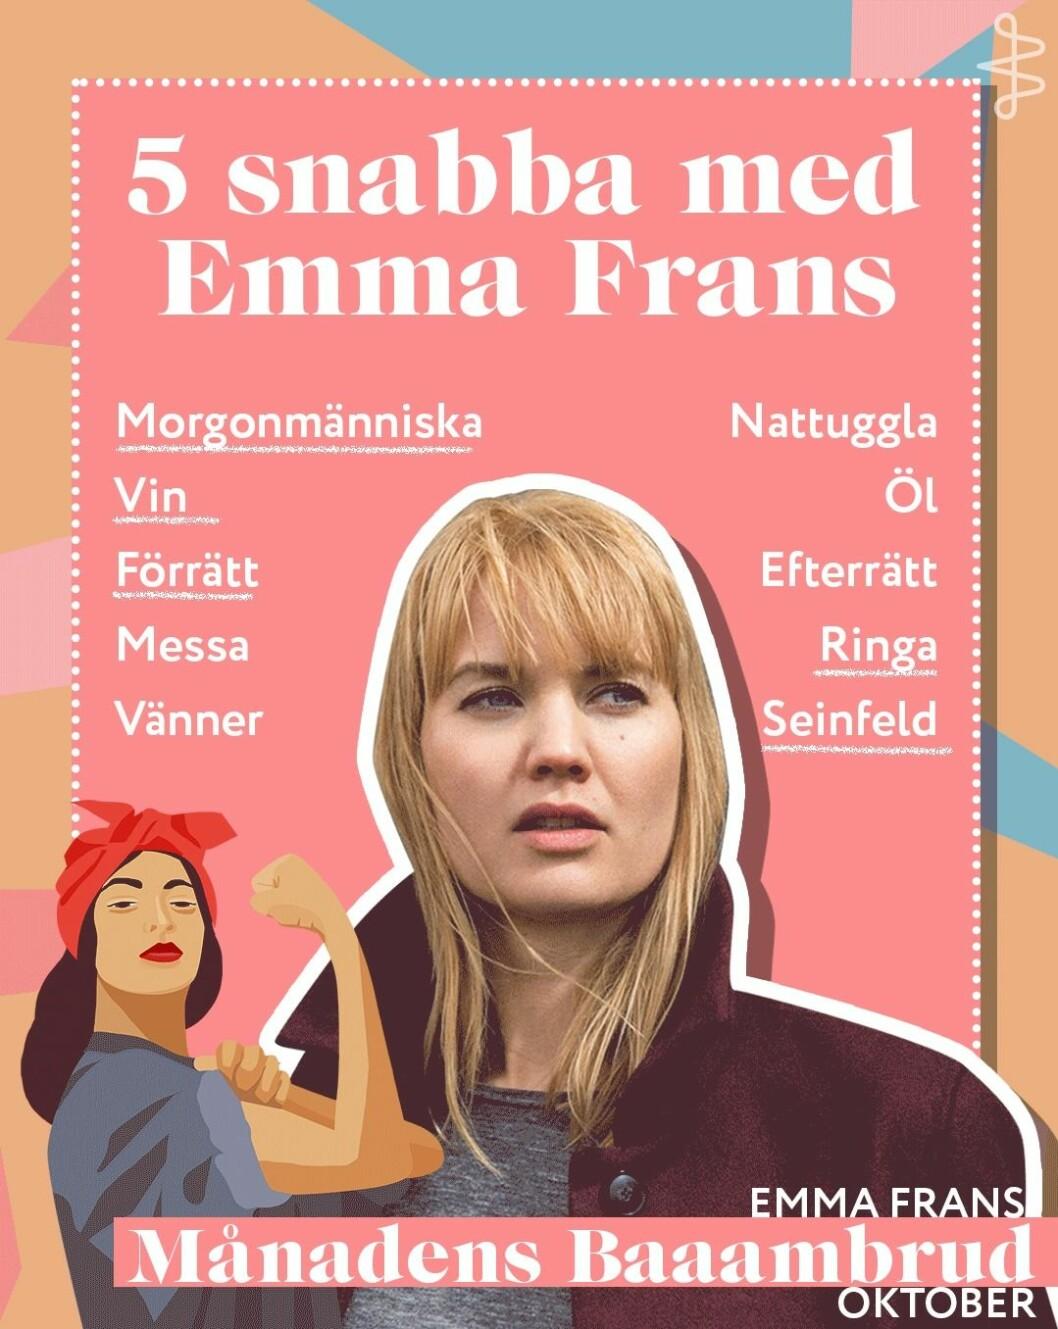 Emma Frans Baaambrud i november 2019